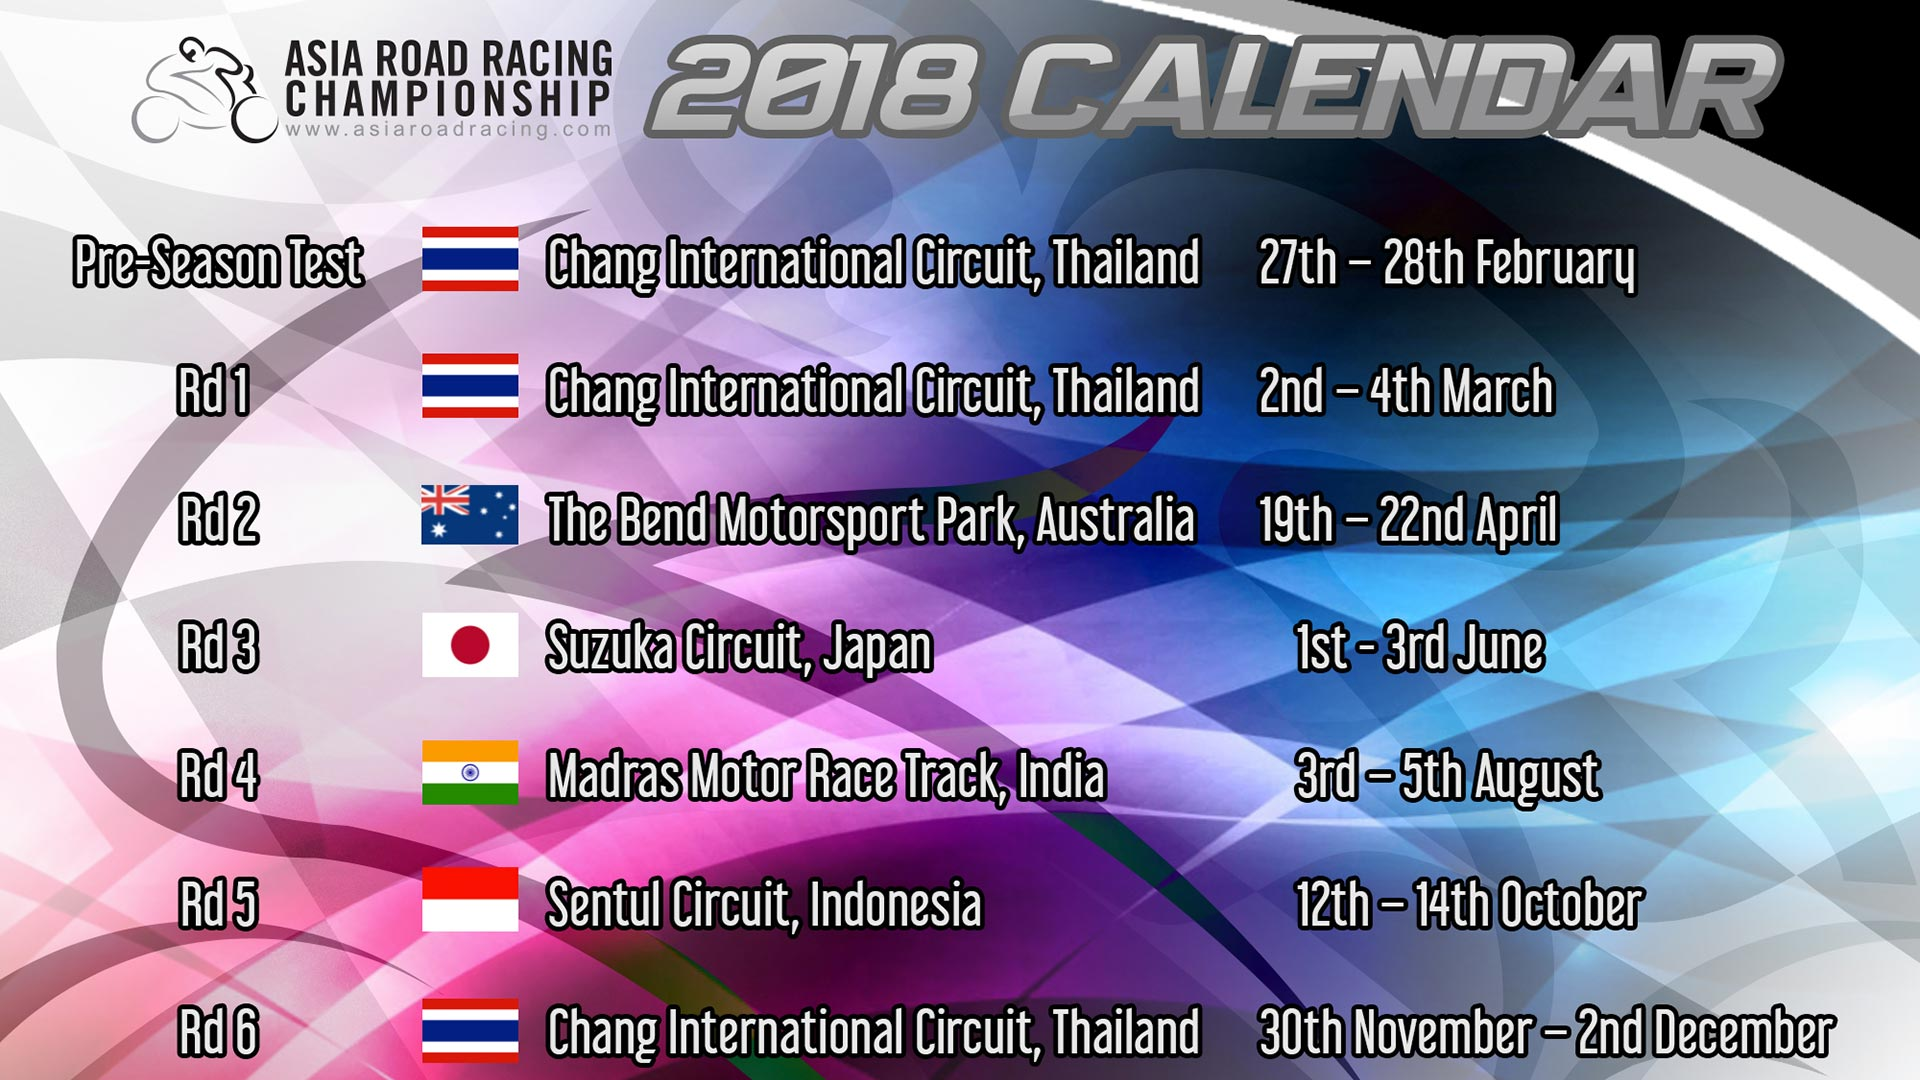 Asia Road Racing Championship 2018 Calendar